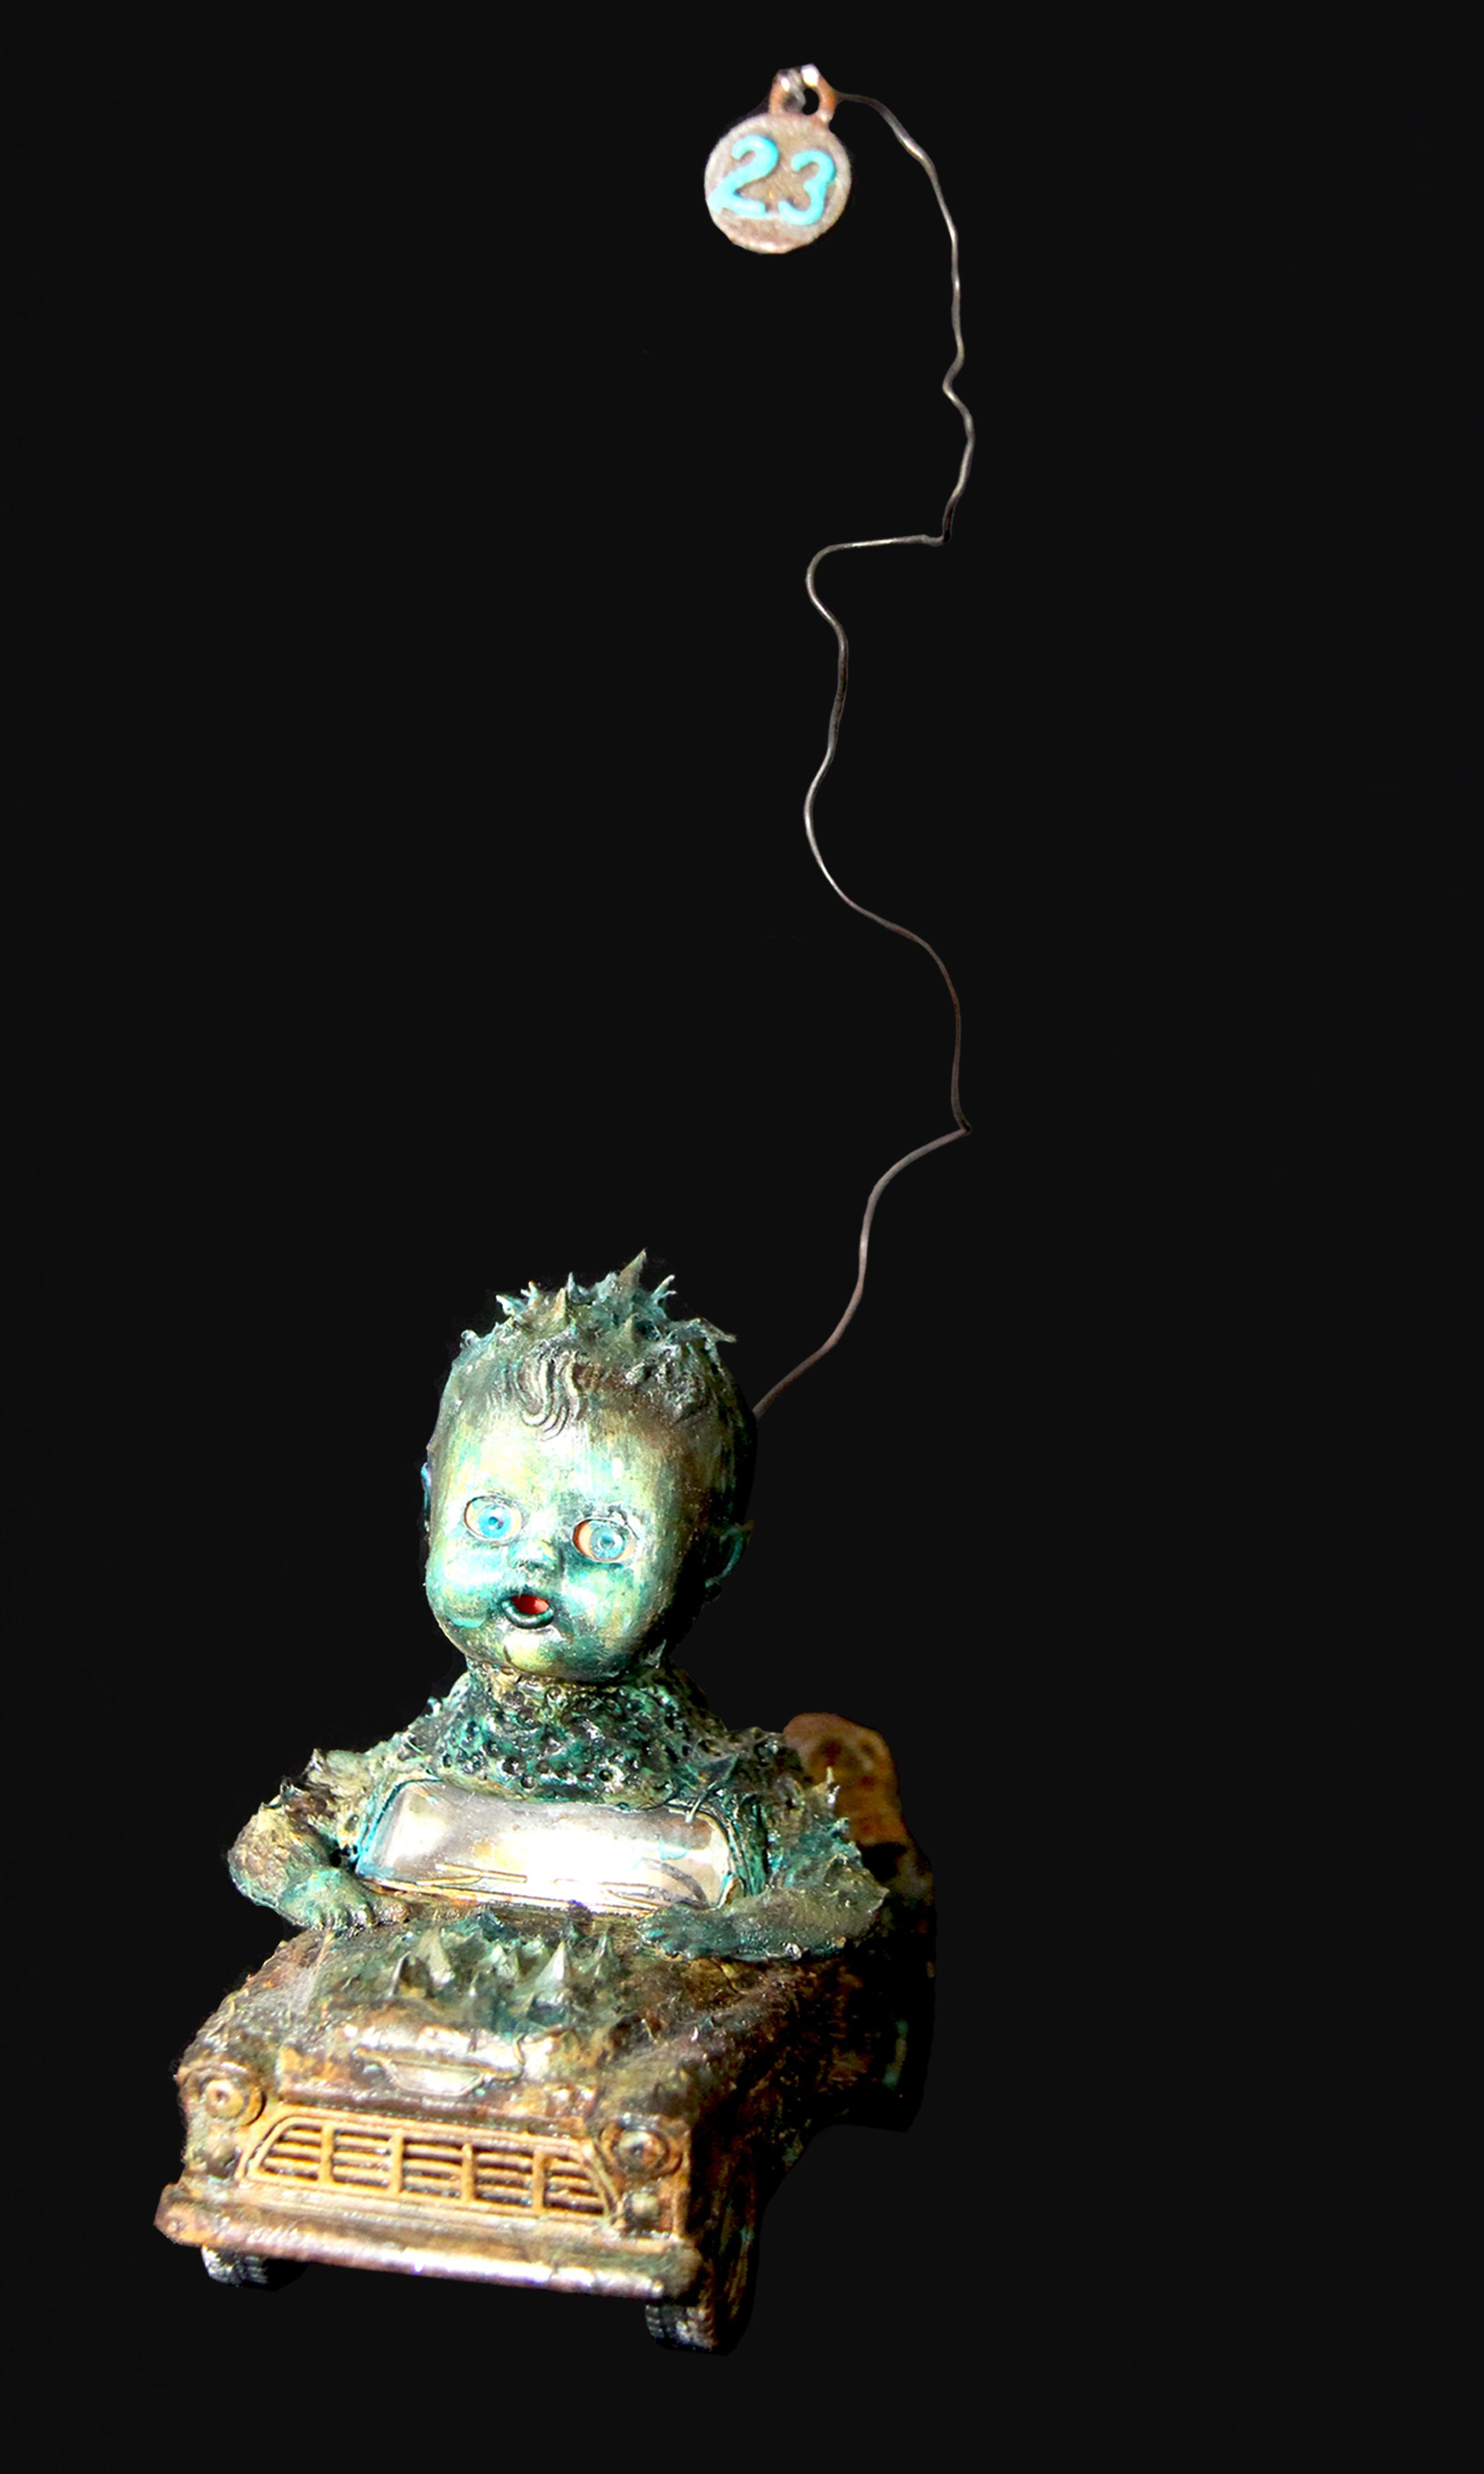 Chucky (sold)